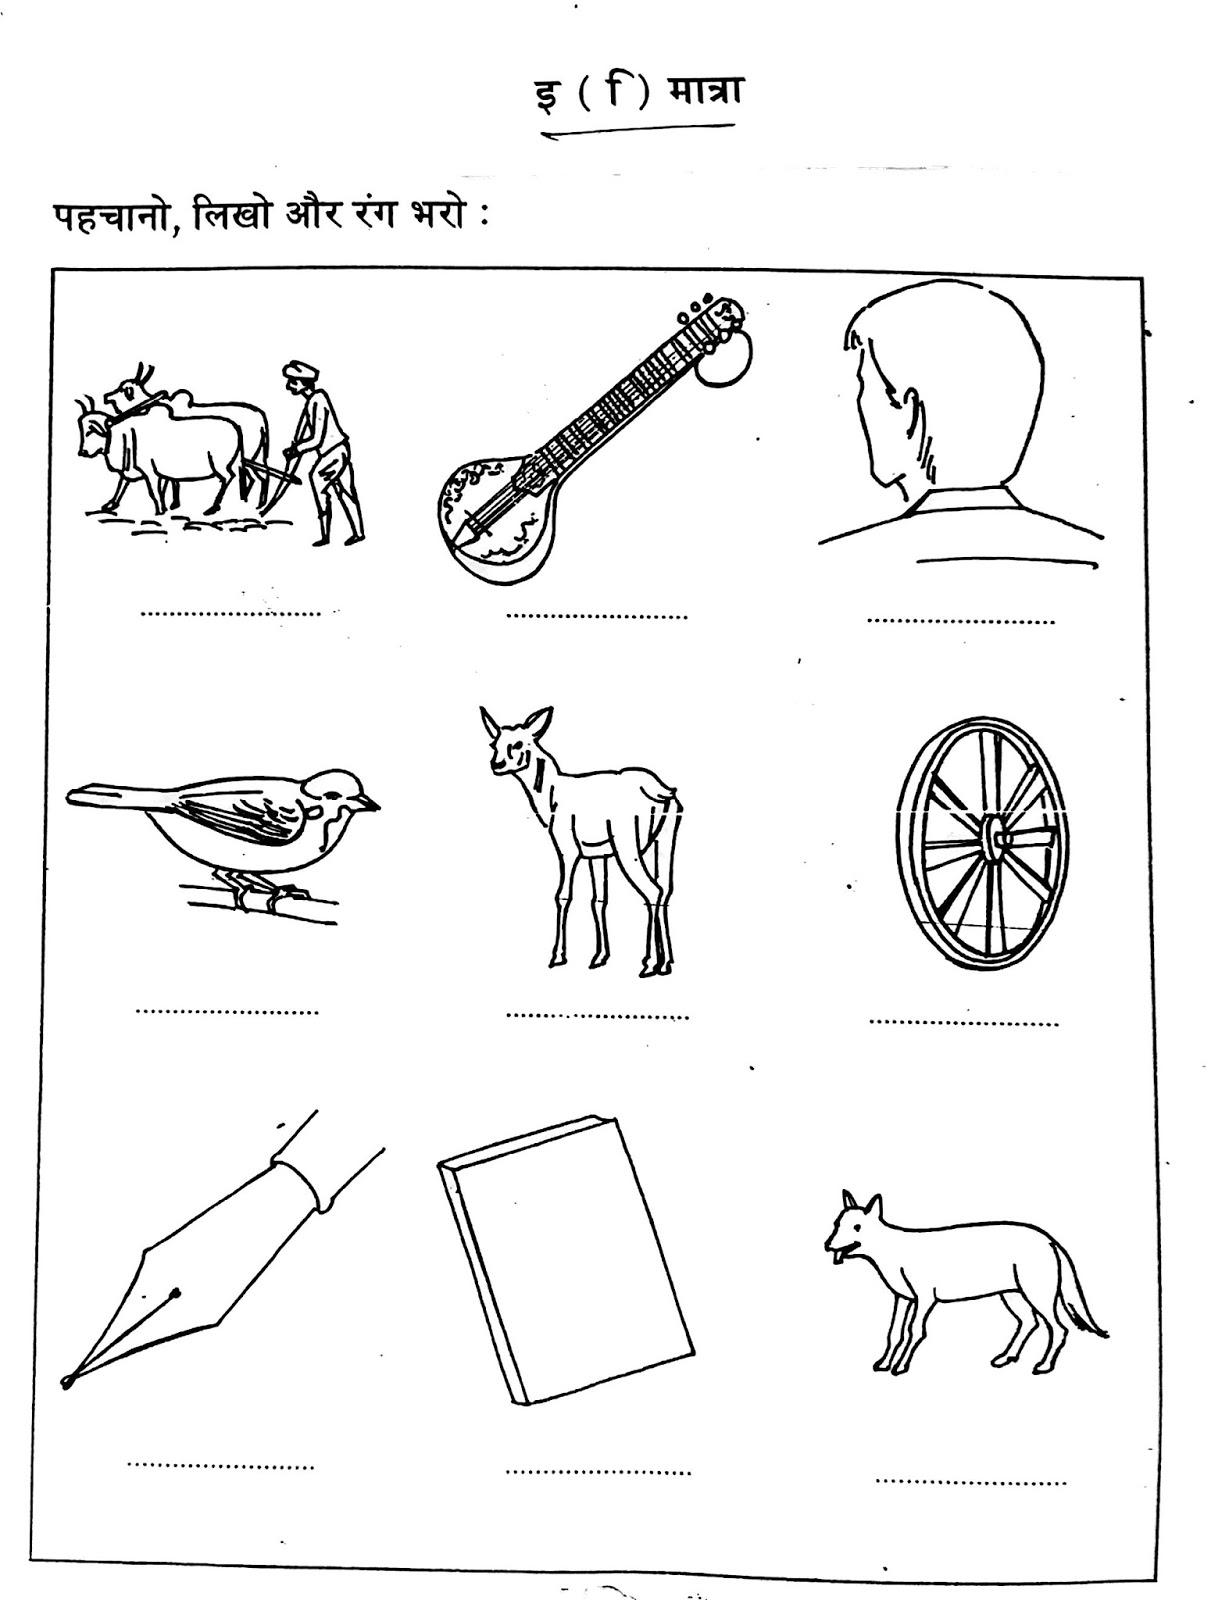 Pin by Araina Sandu on worksheets (With images) Hindi